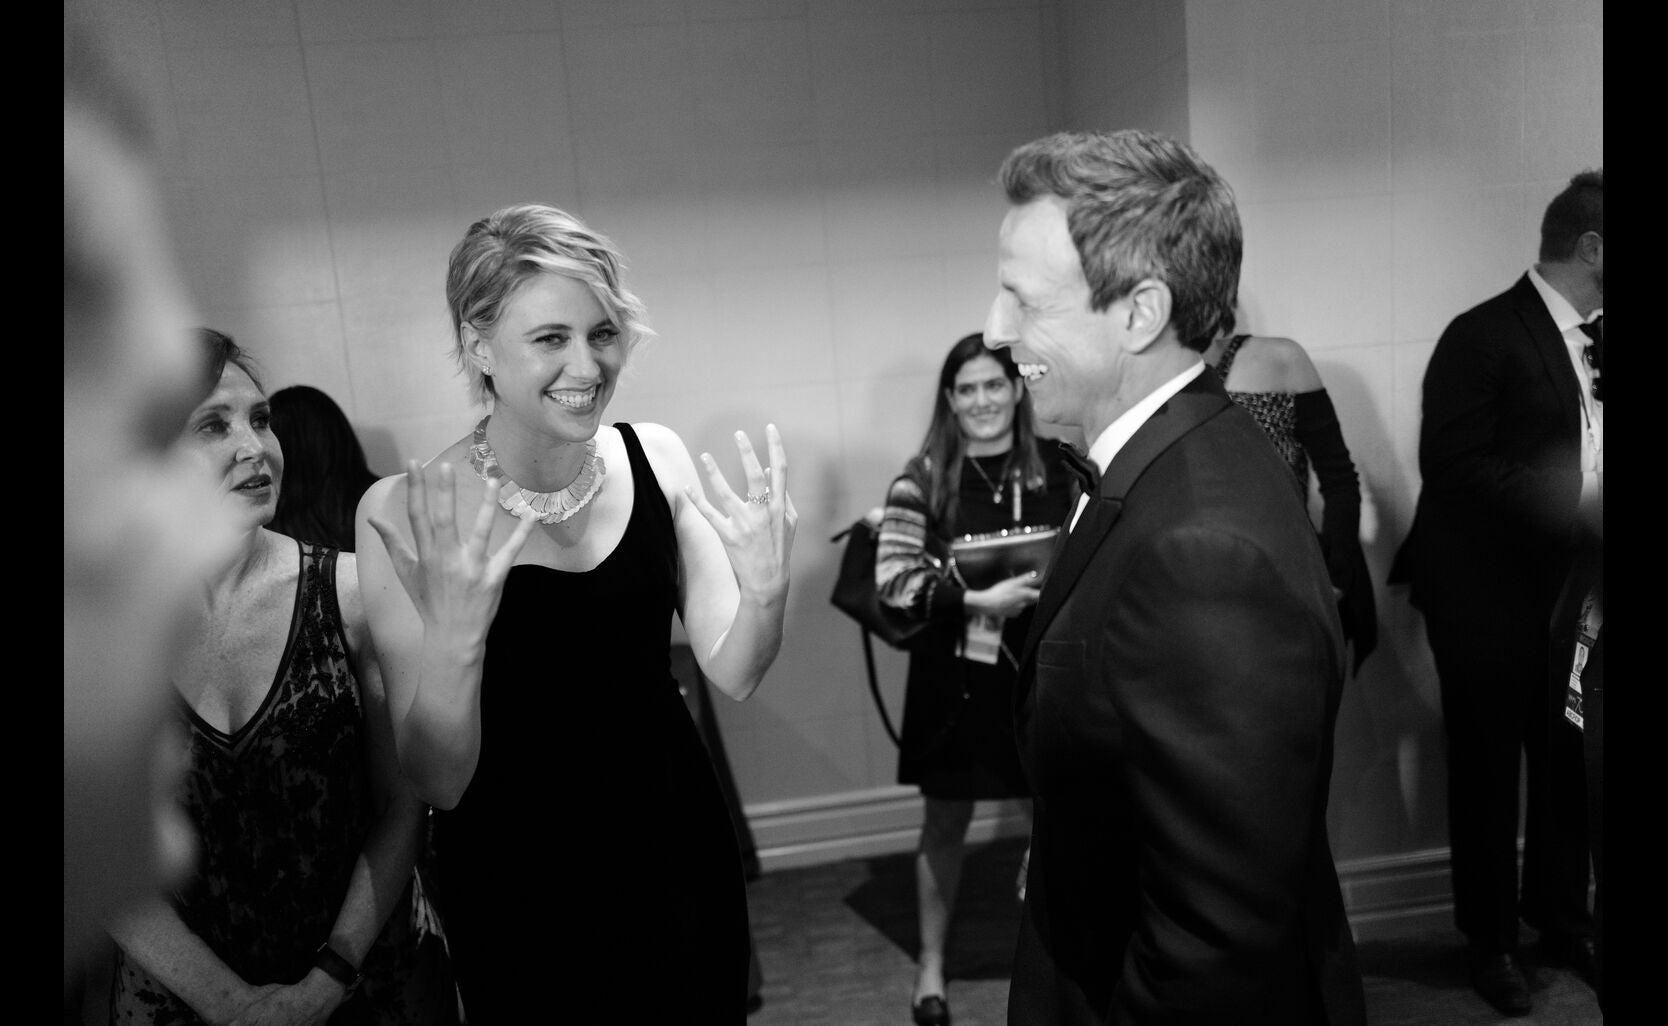 Golden Globe winner Greta Gerwig and host Seth Meyer